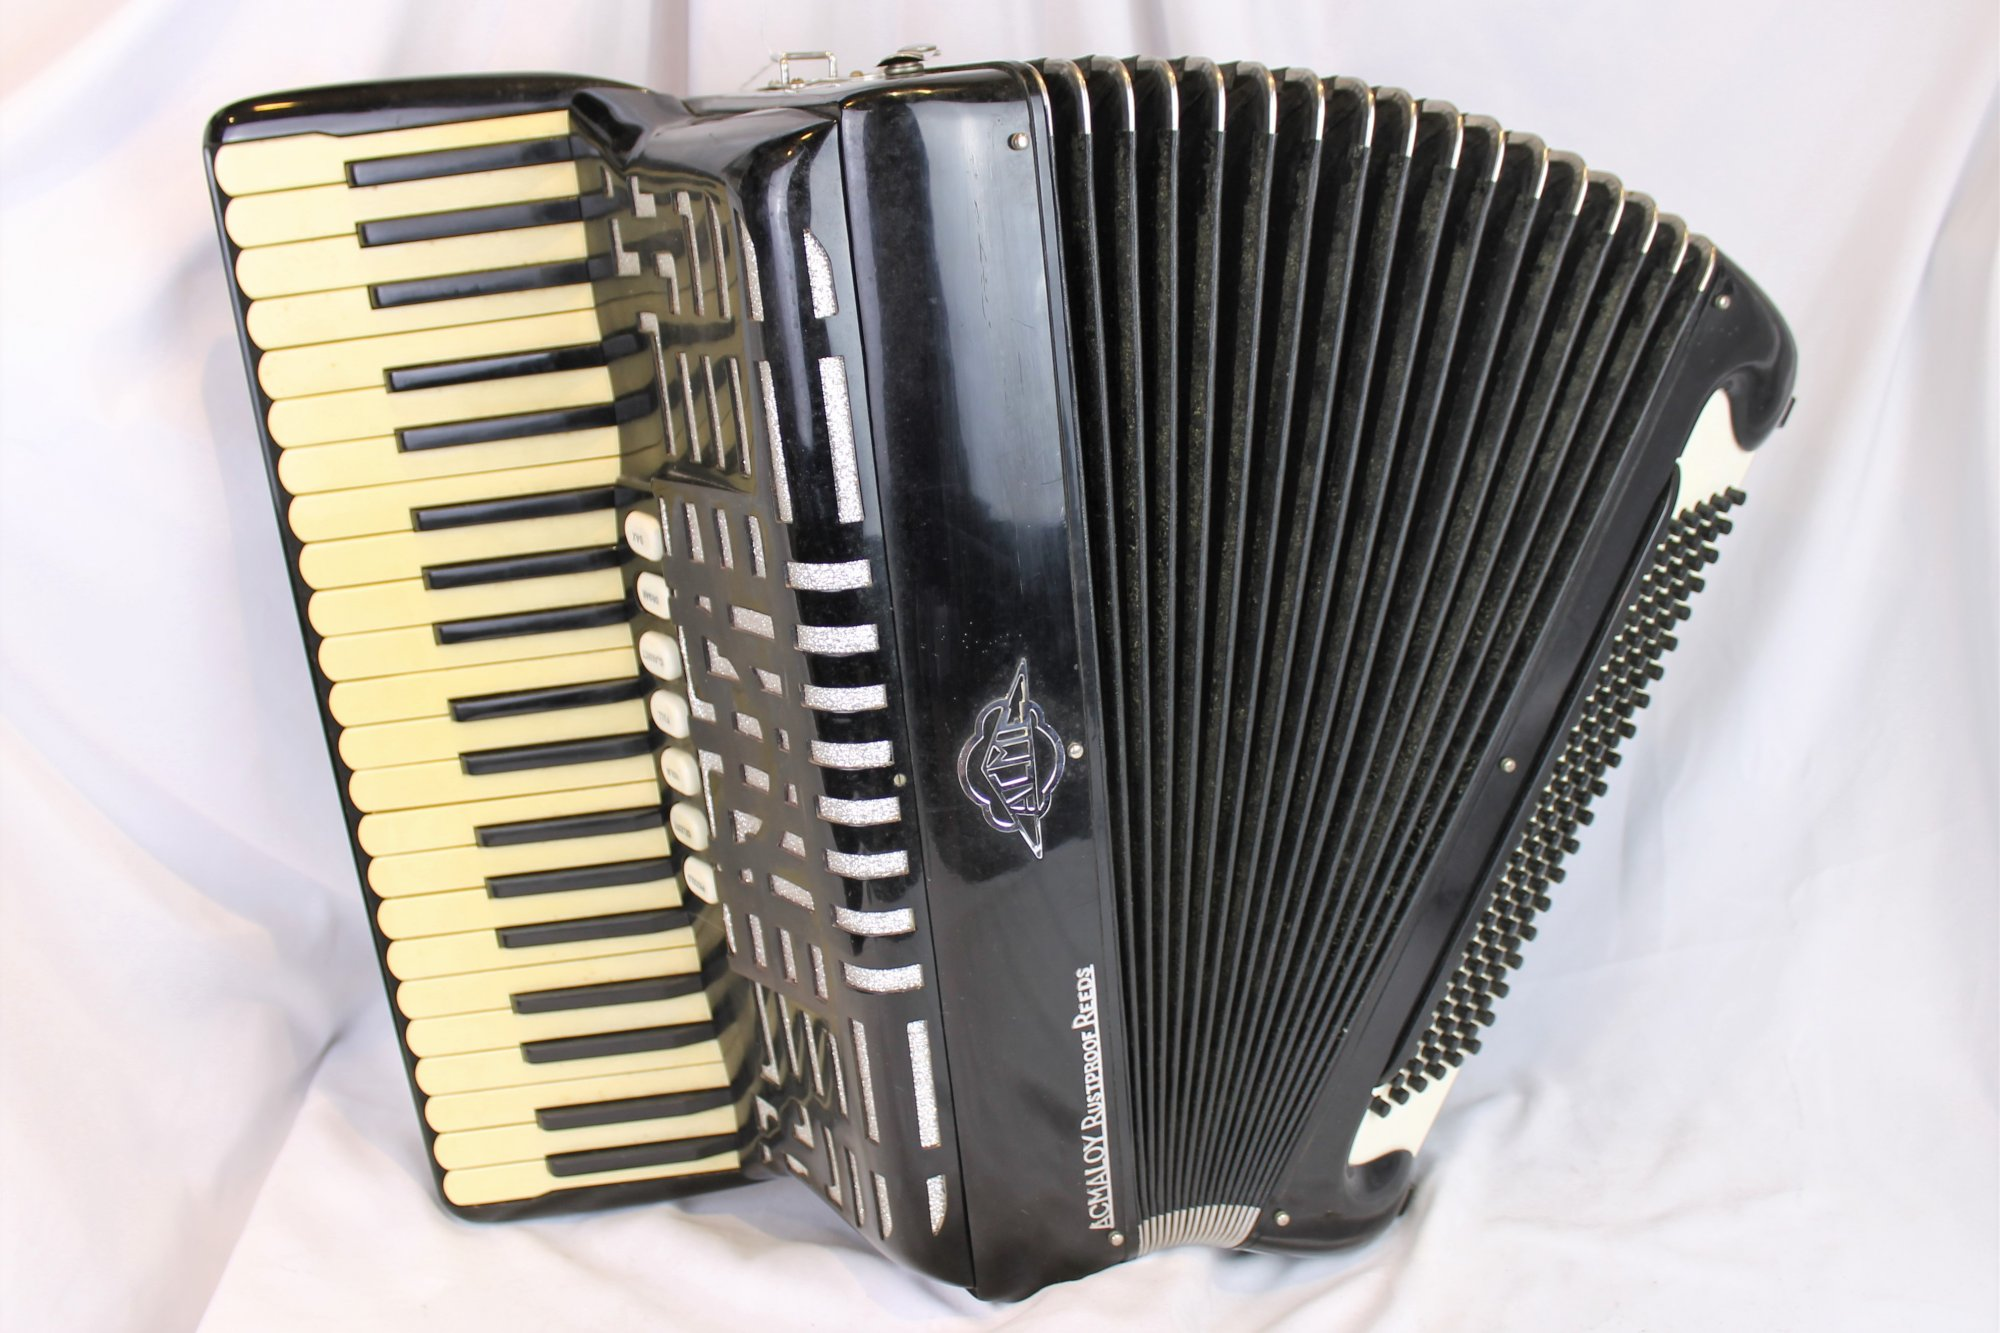 4370 - Black Acme Acmaloy Rustproof Reeds Piano Accordion LMMH 41 120